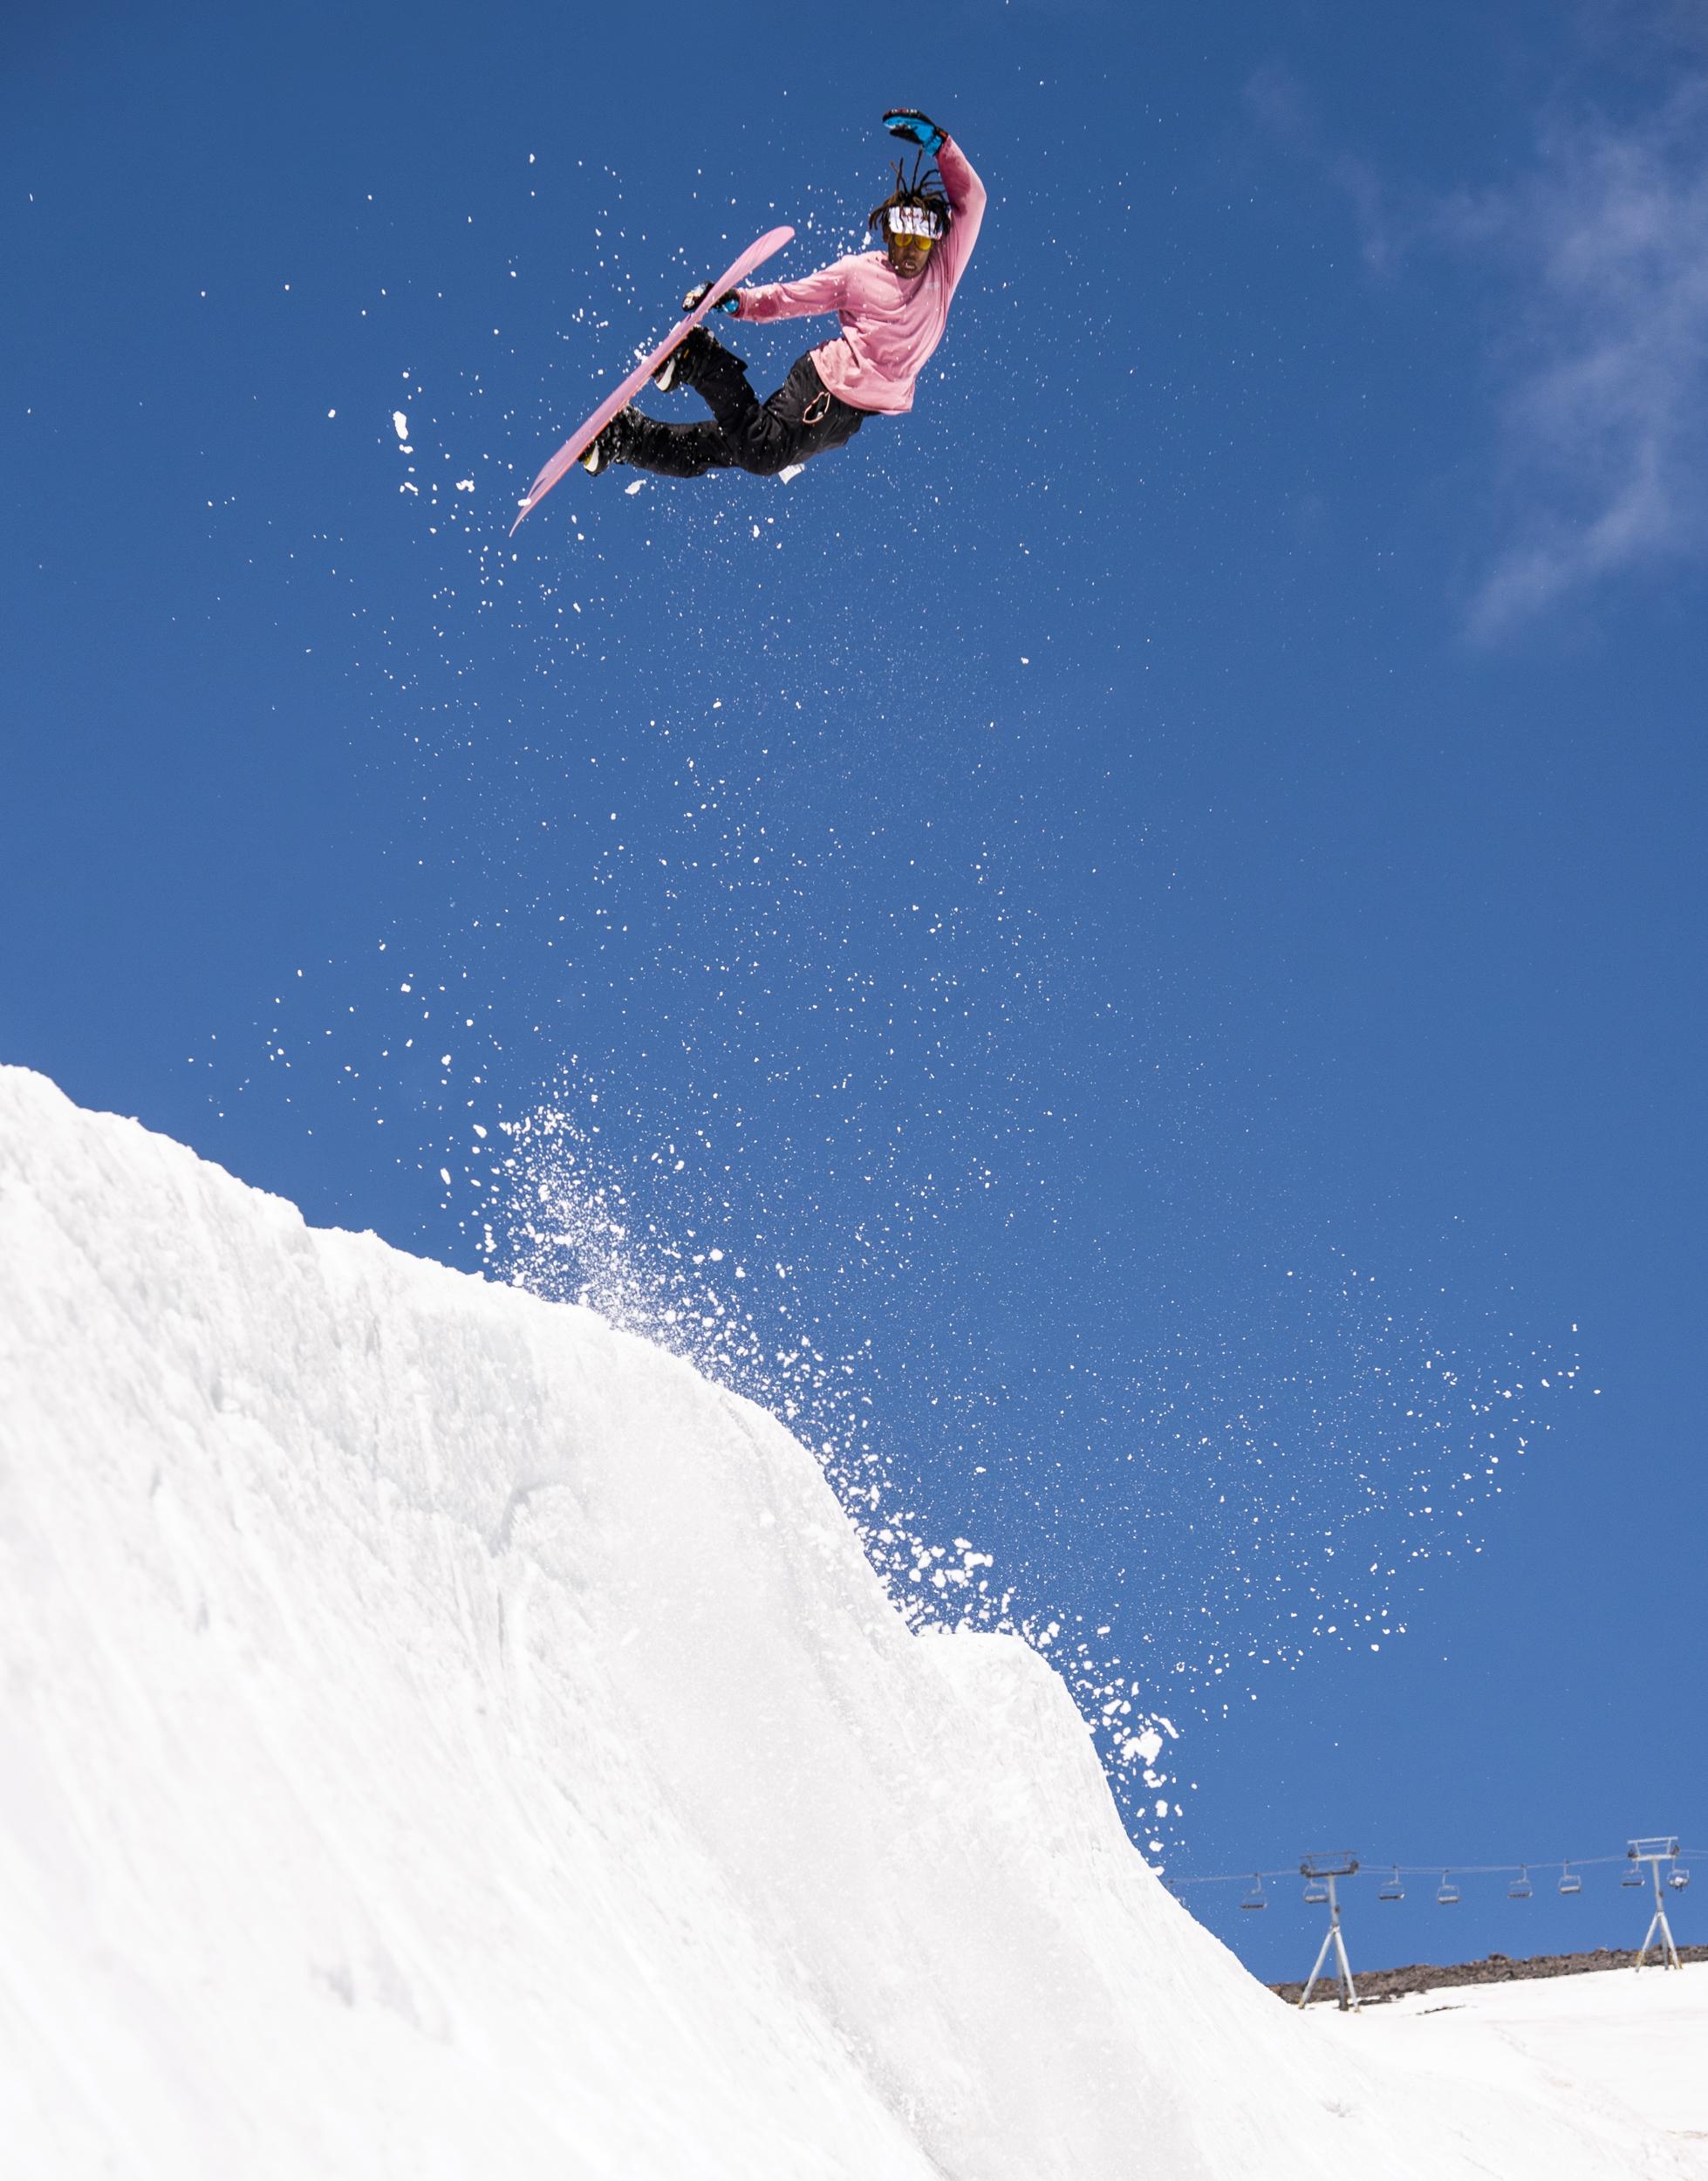 zeb powell interview snowboarder